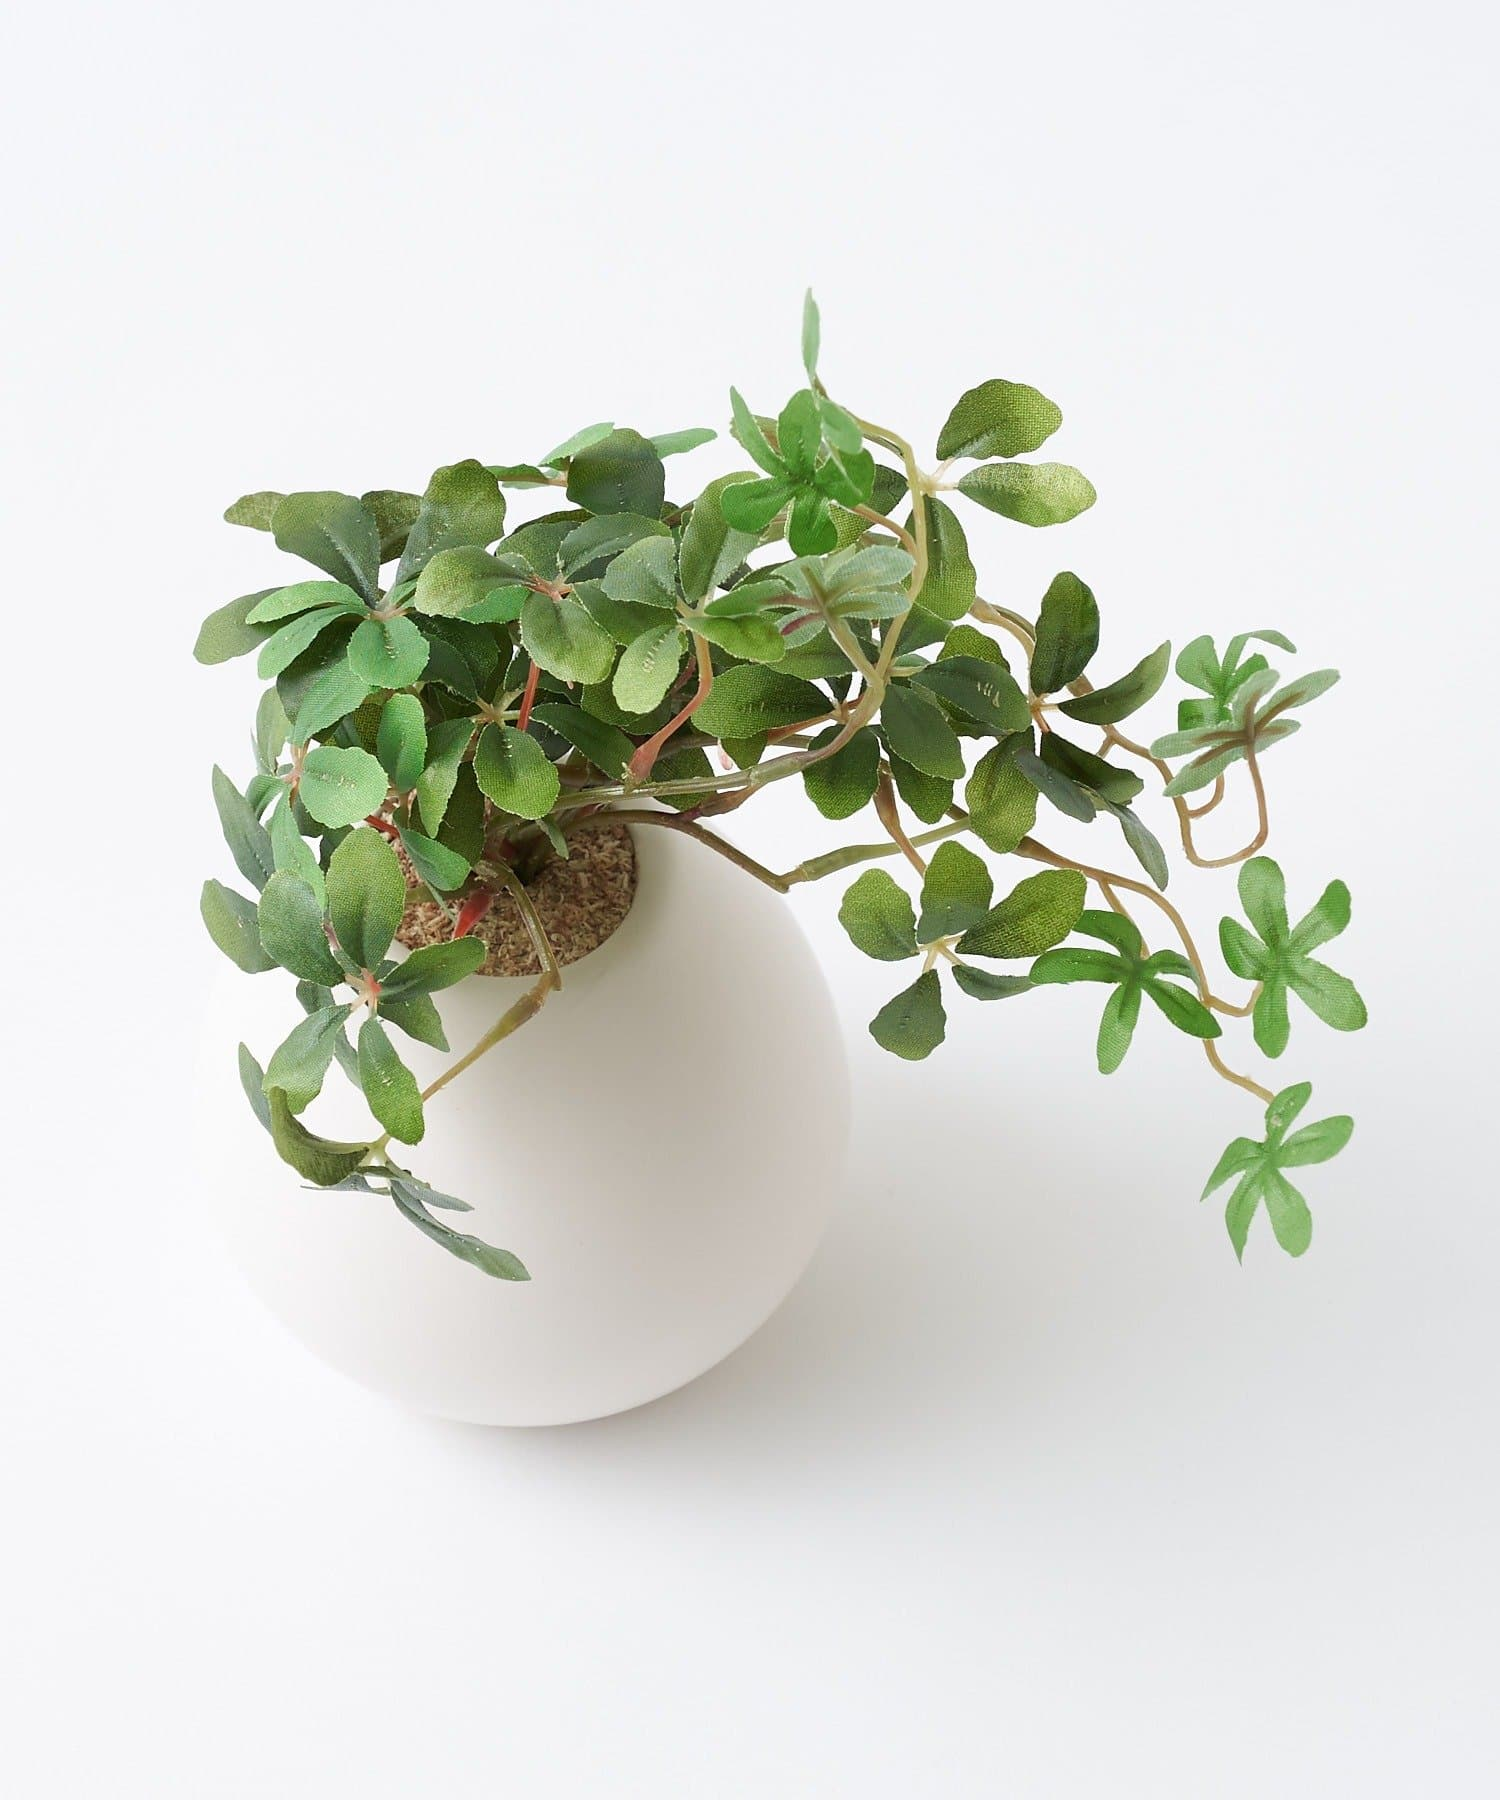 CIAOPANIC TYPY(チャオパニックティピー) ライフスタイル 〈ミニ観葉植物・フェイクグリーン〉MRポット グリーンその他1